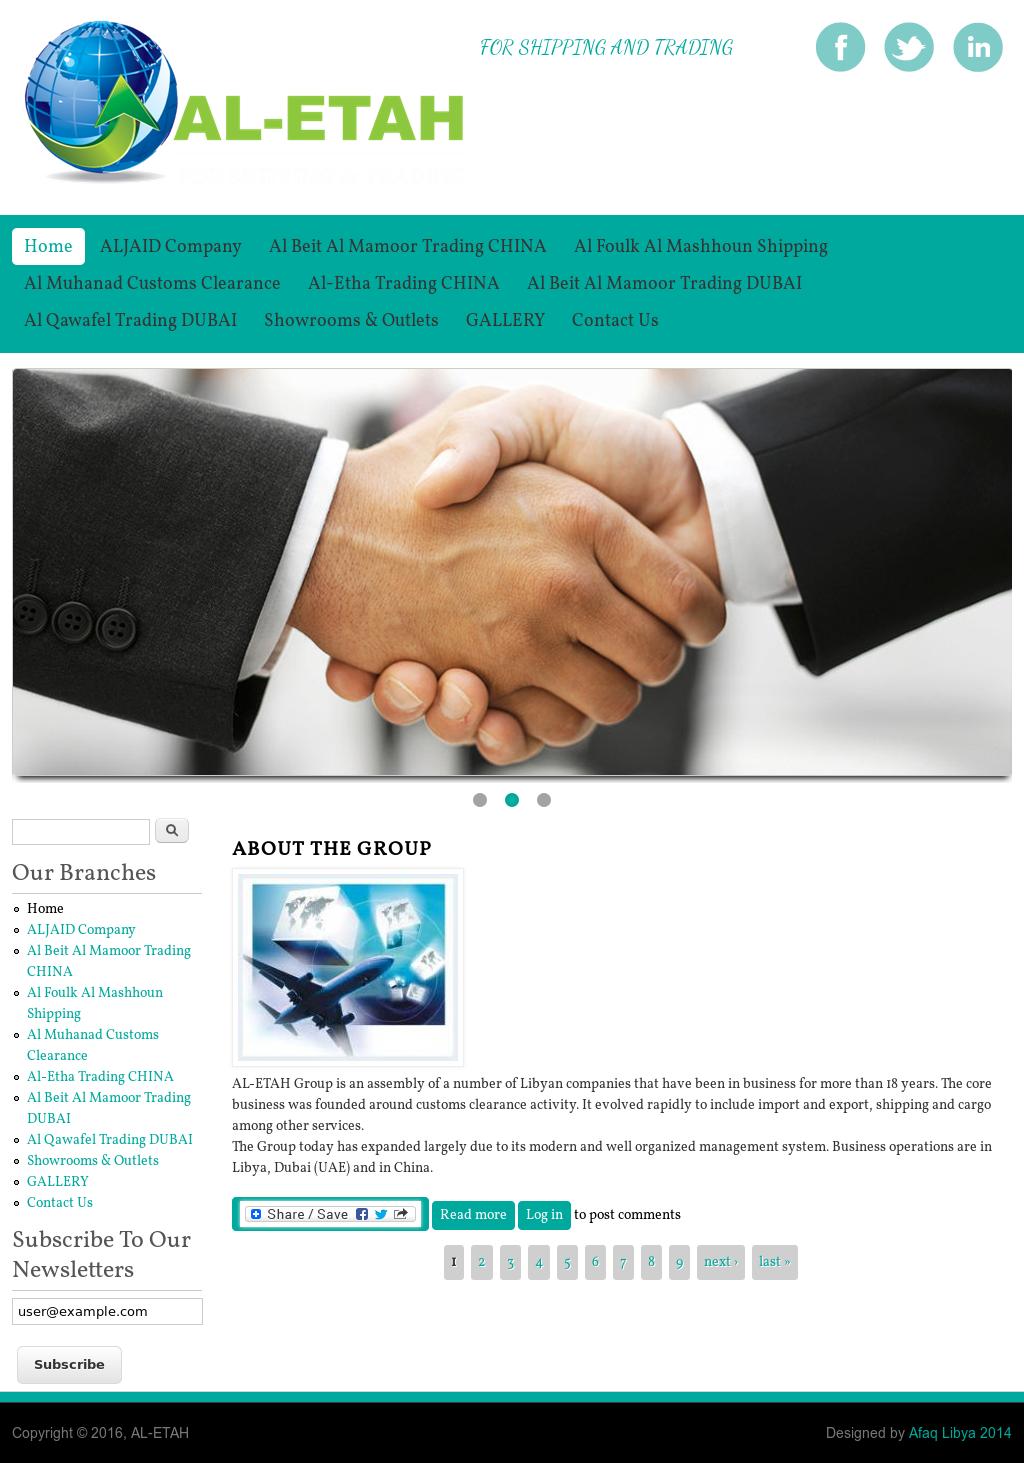 Al-etah Competitors, Revenue and Employees - Owler Company